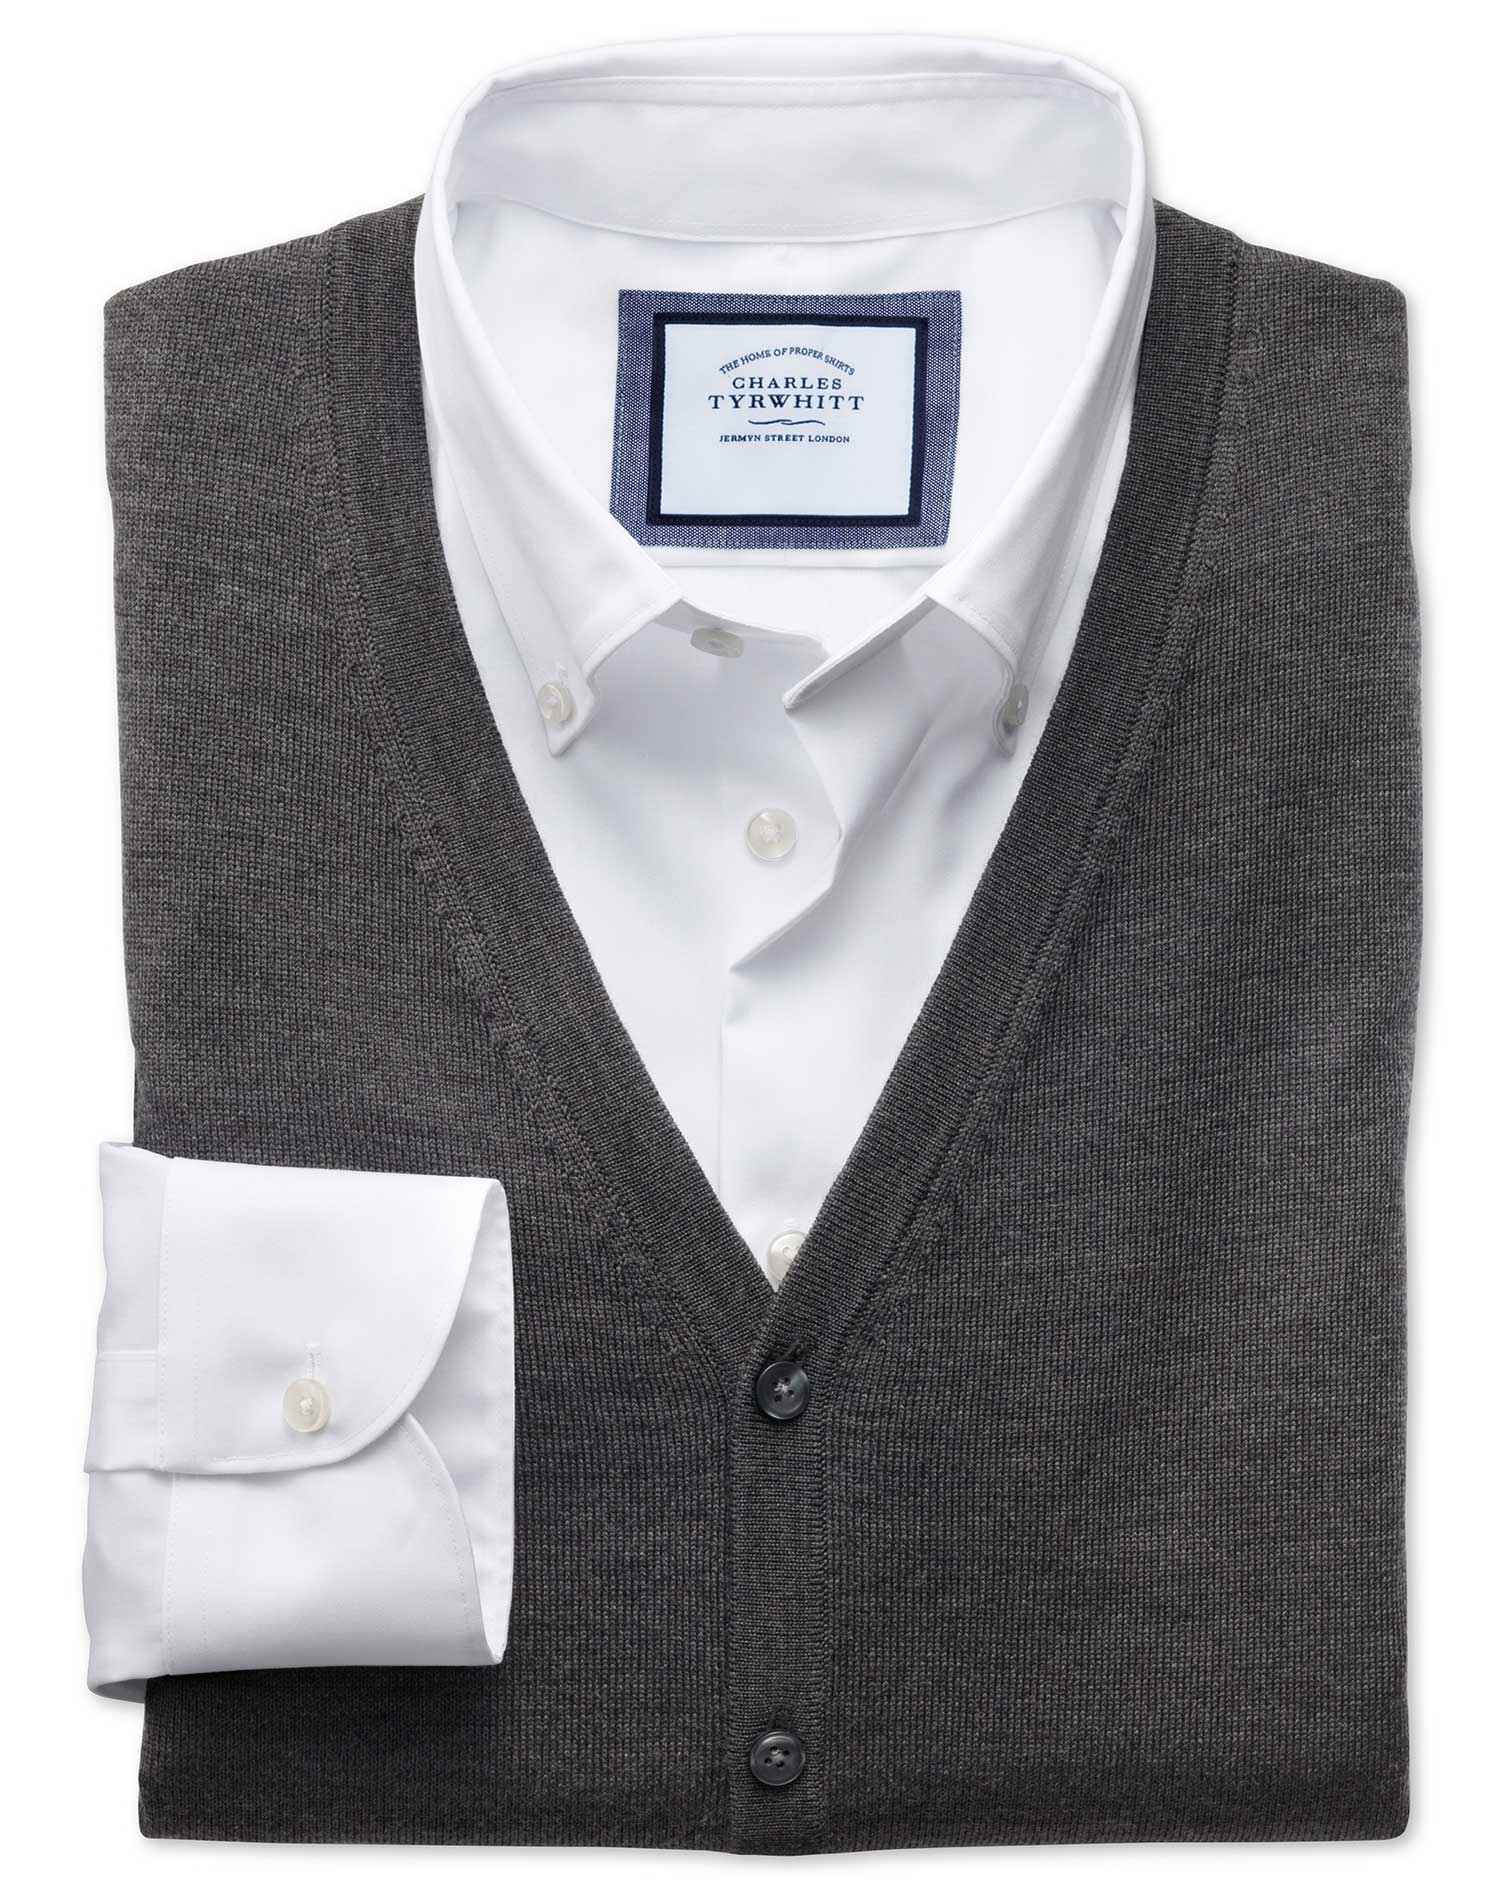 Charcoal Merino Wool Waistcoat Size XL by Charles Tyrwhitt